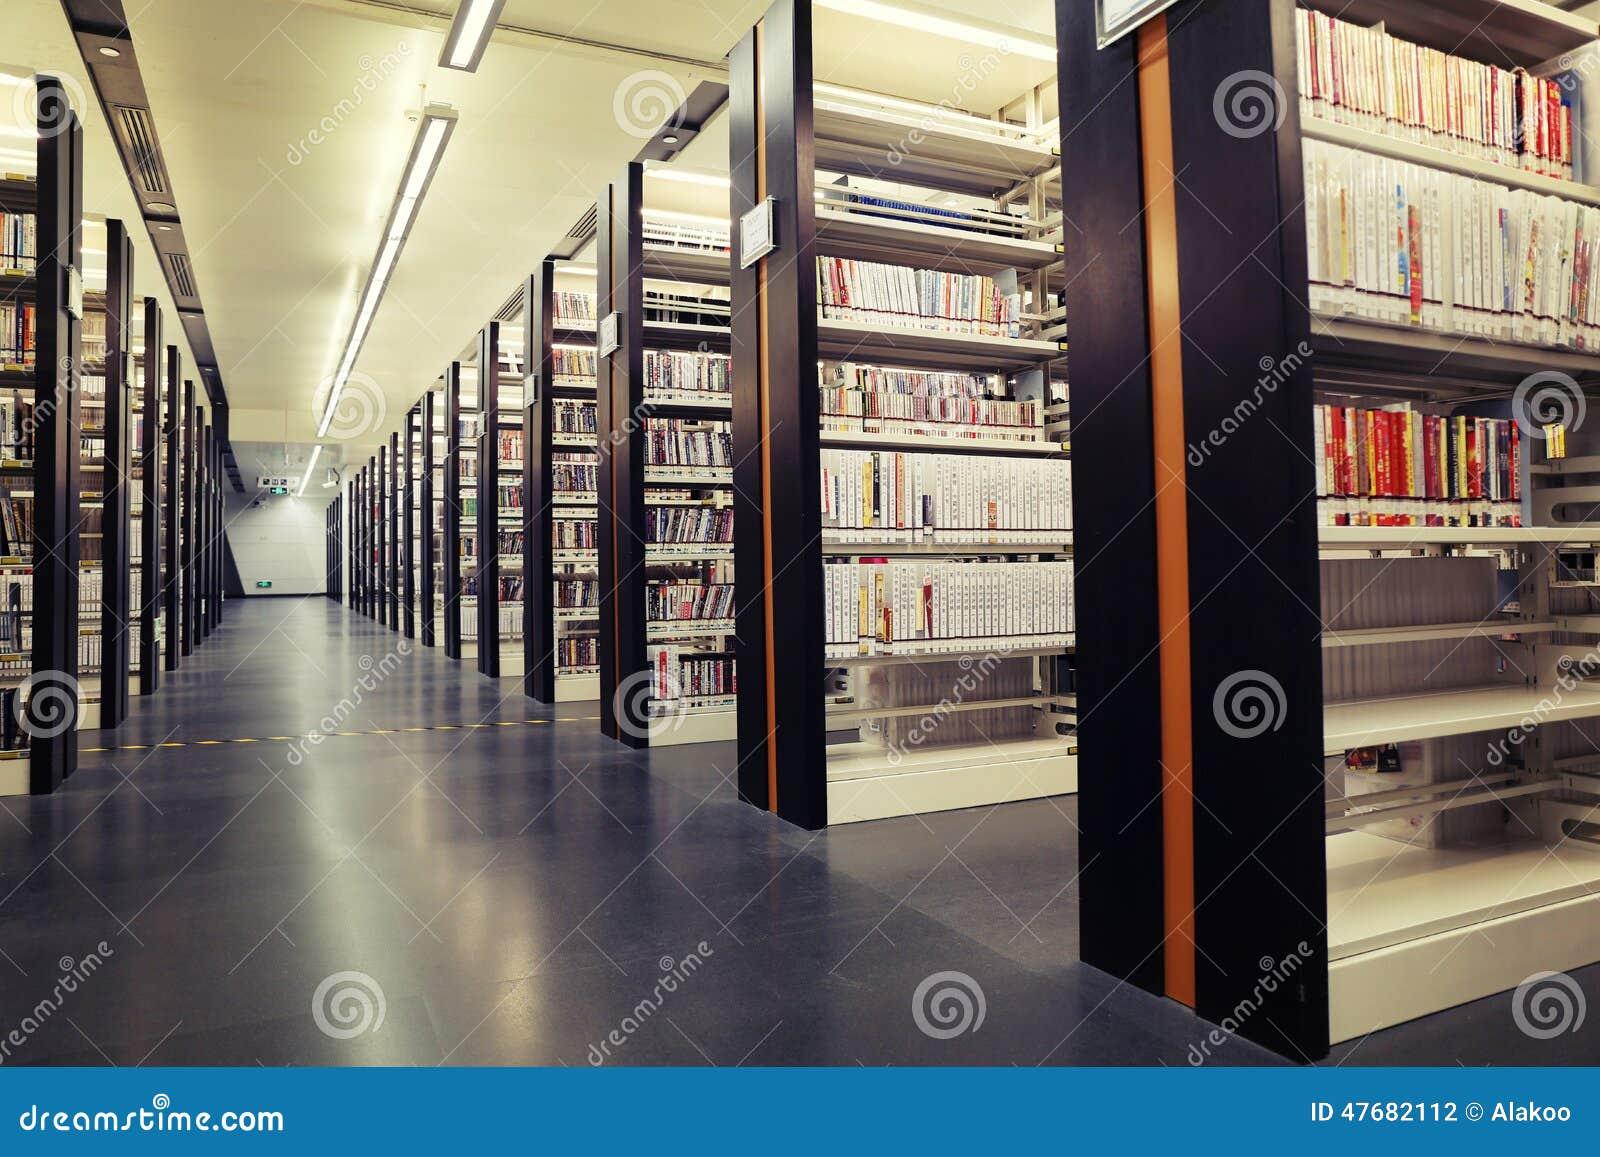 Böcker på hyllor i arkiv, arkivbokhyllor med böcker, arkivbokhyllor, bookracks